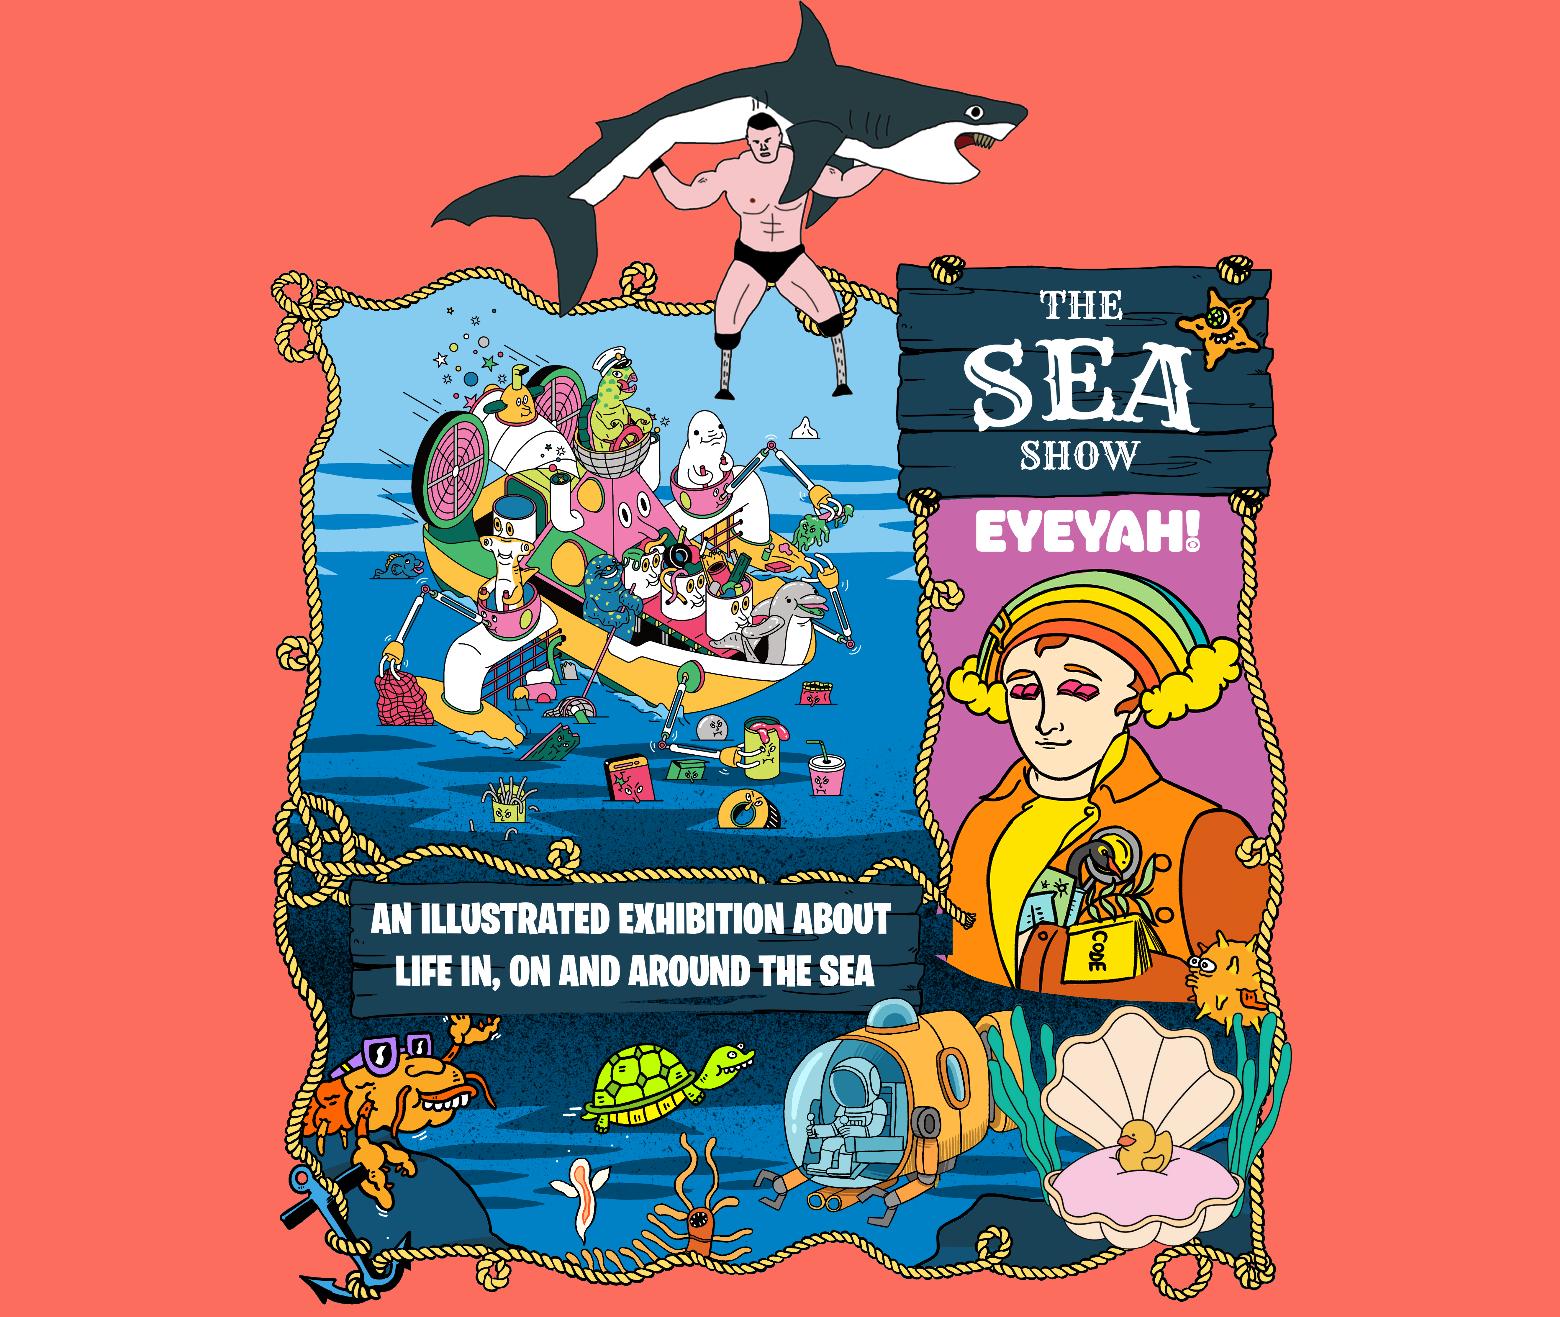 The Sea Show!